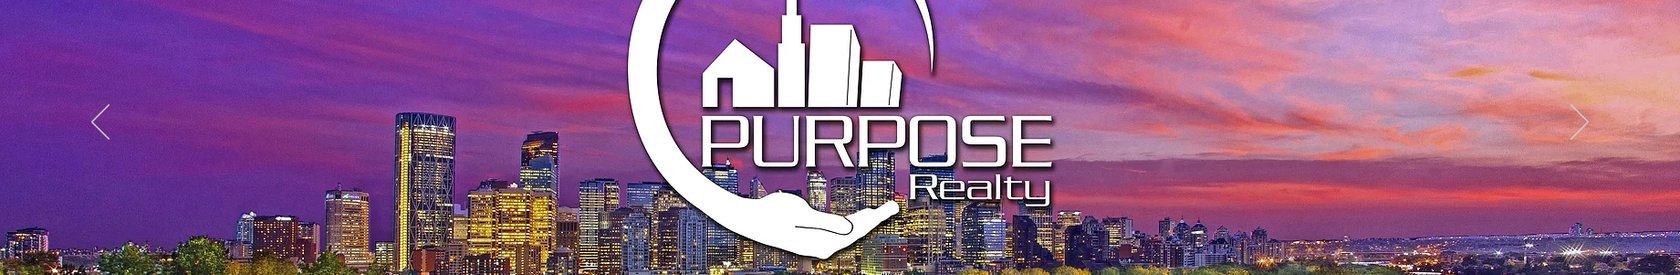 PURPOSE REALTY